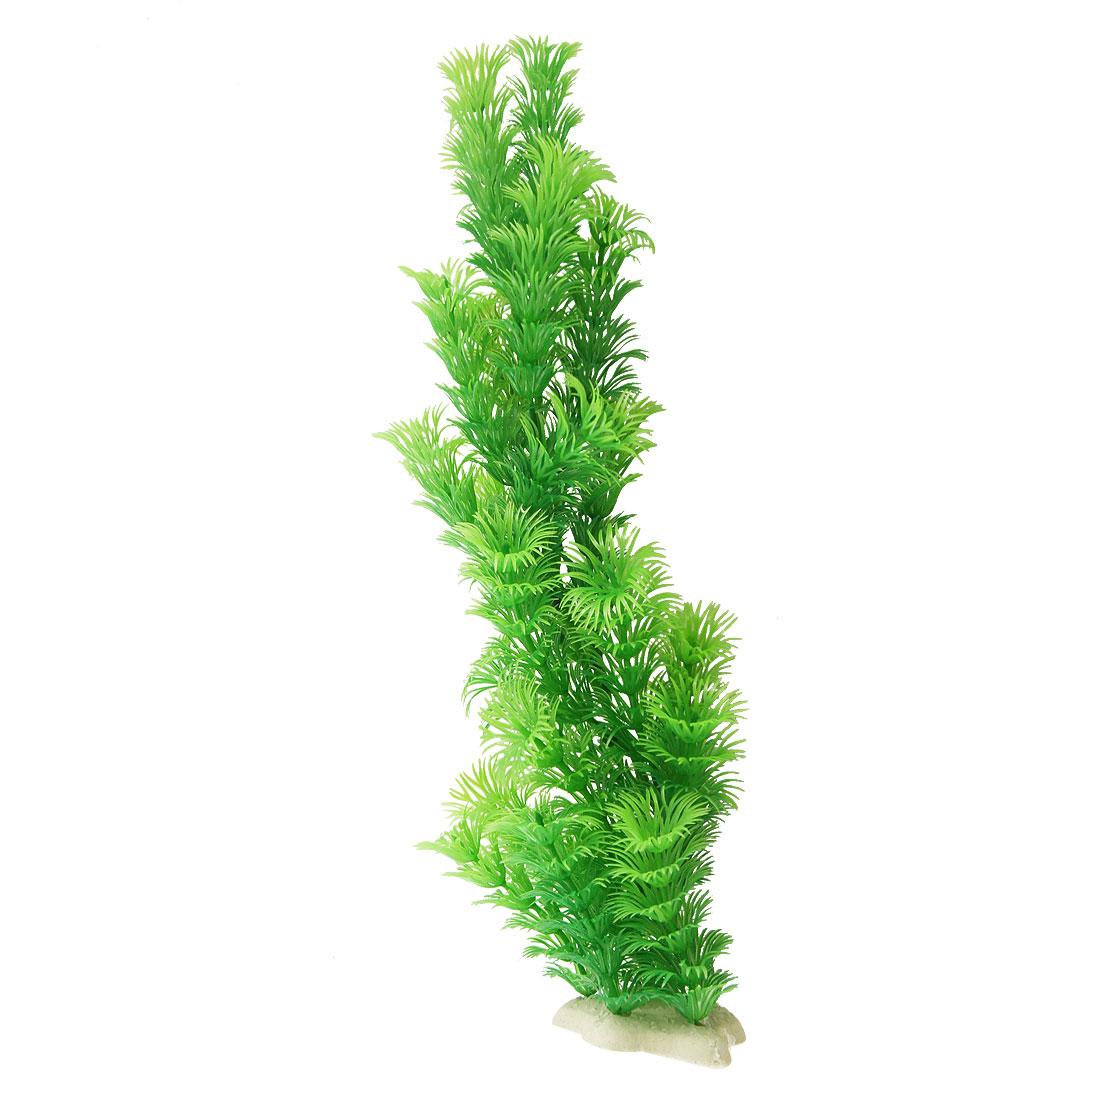 "Aquarium Green Plastic Artificial Grass Plant 12.2"" Height"